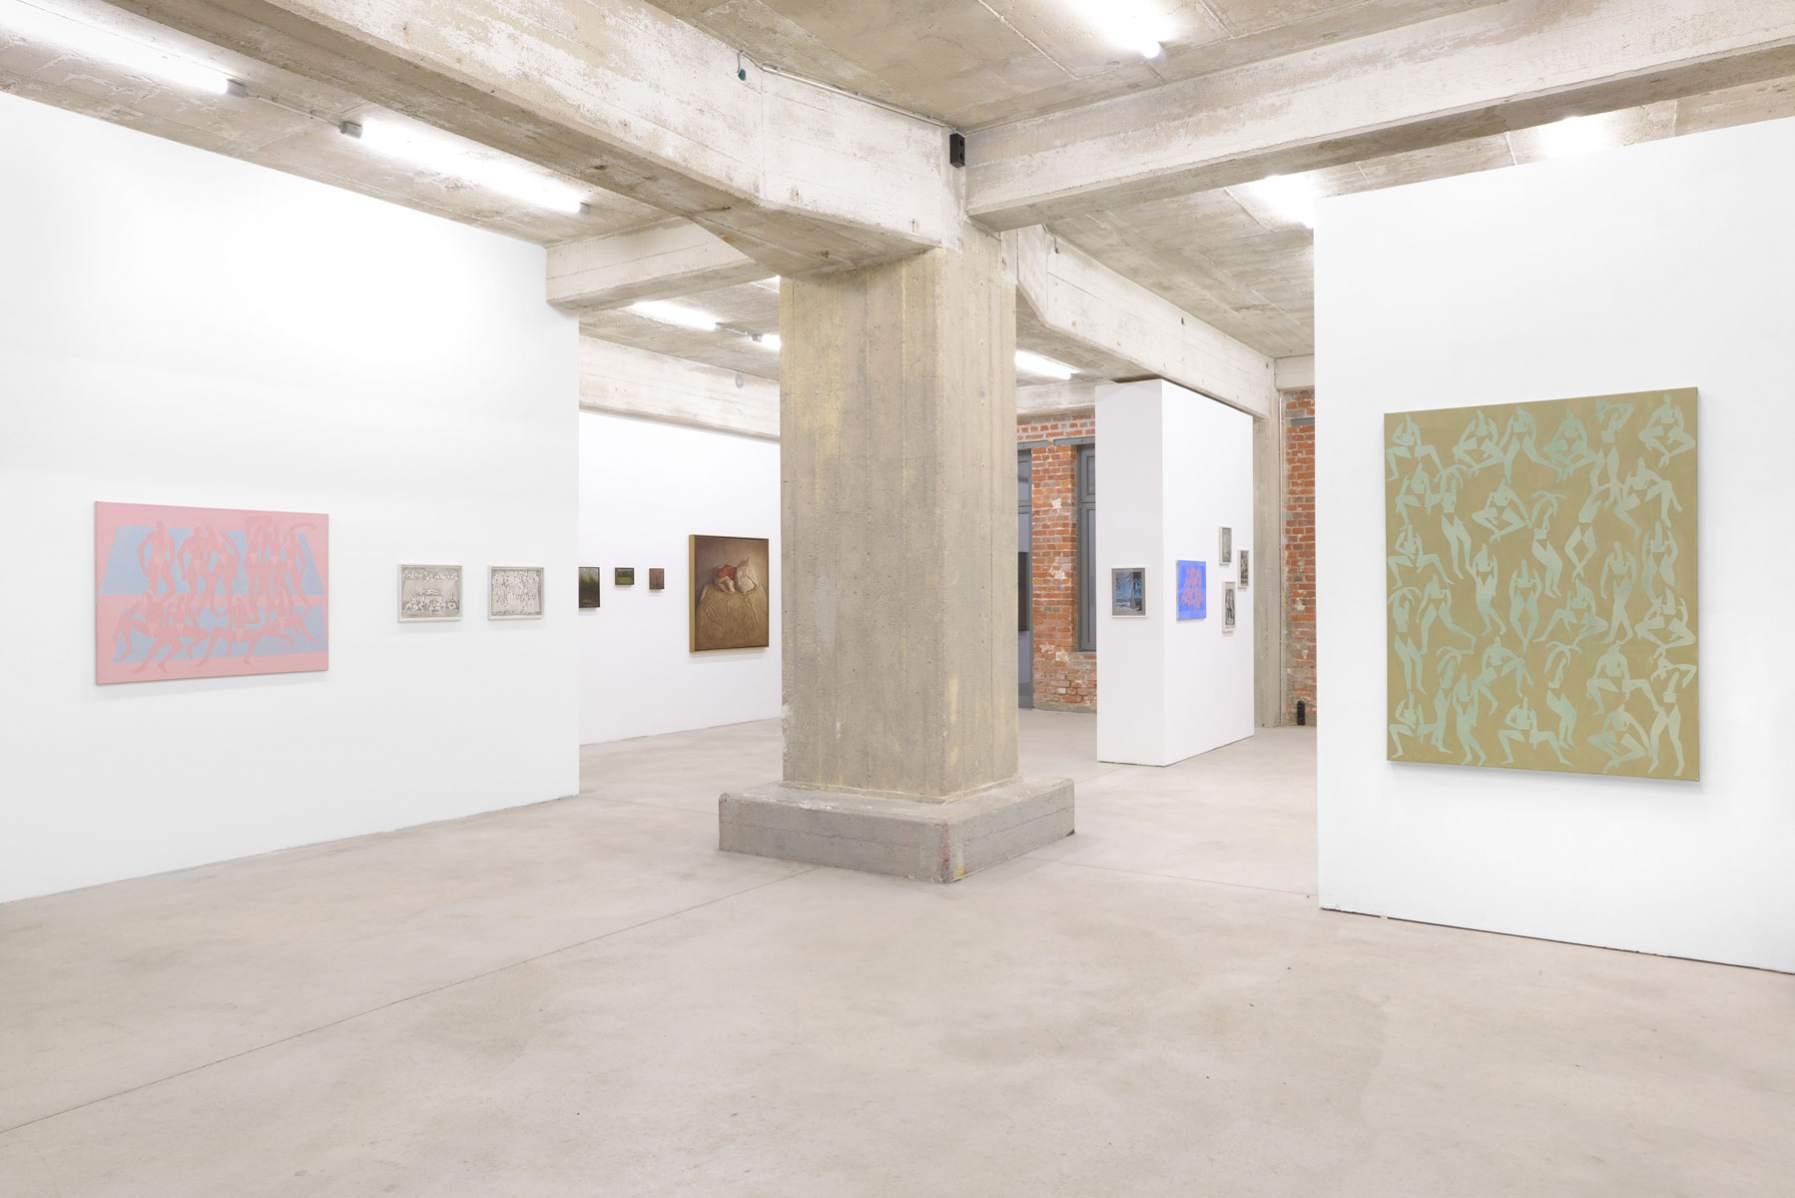 Galerie Kleindienst - Junge Kunst 2